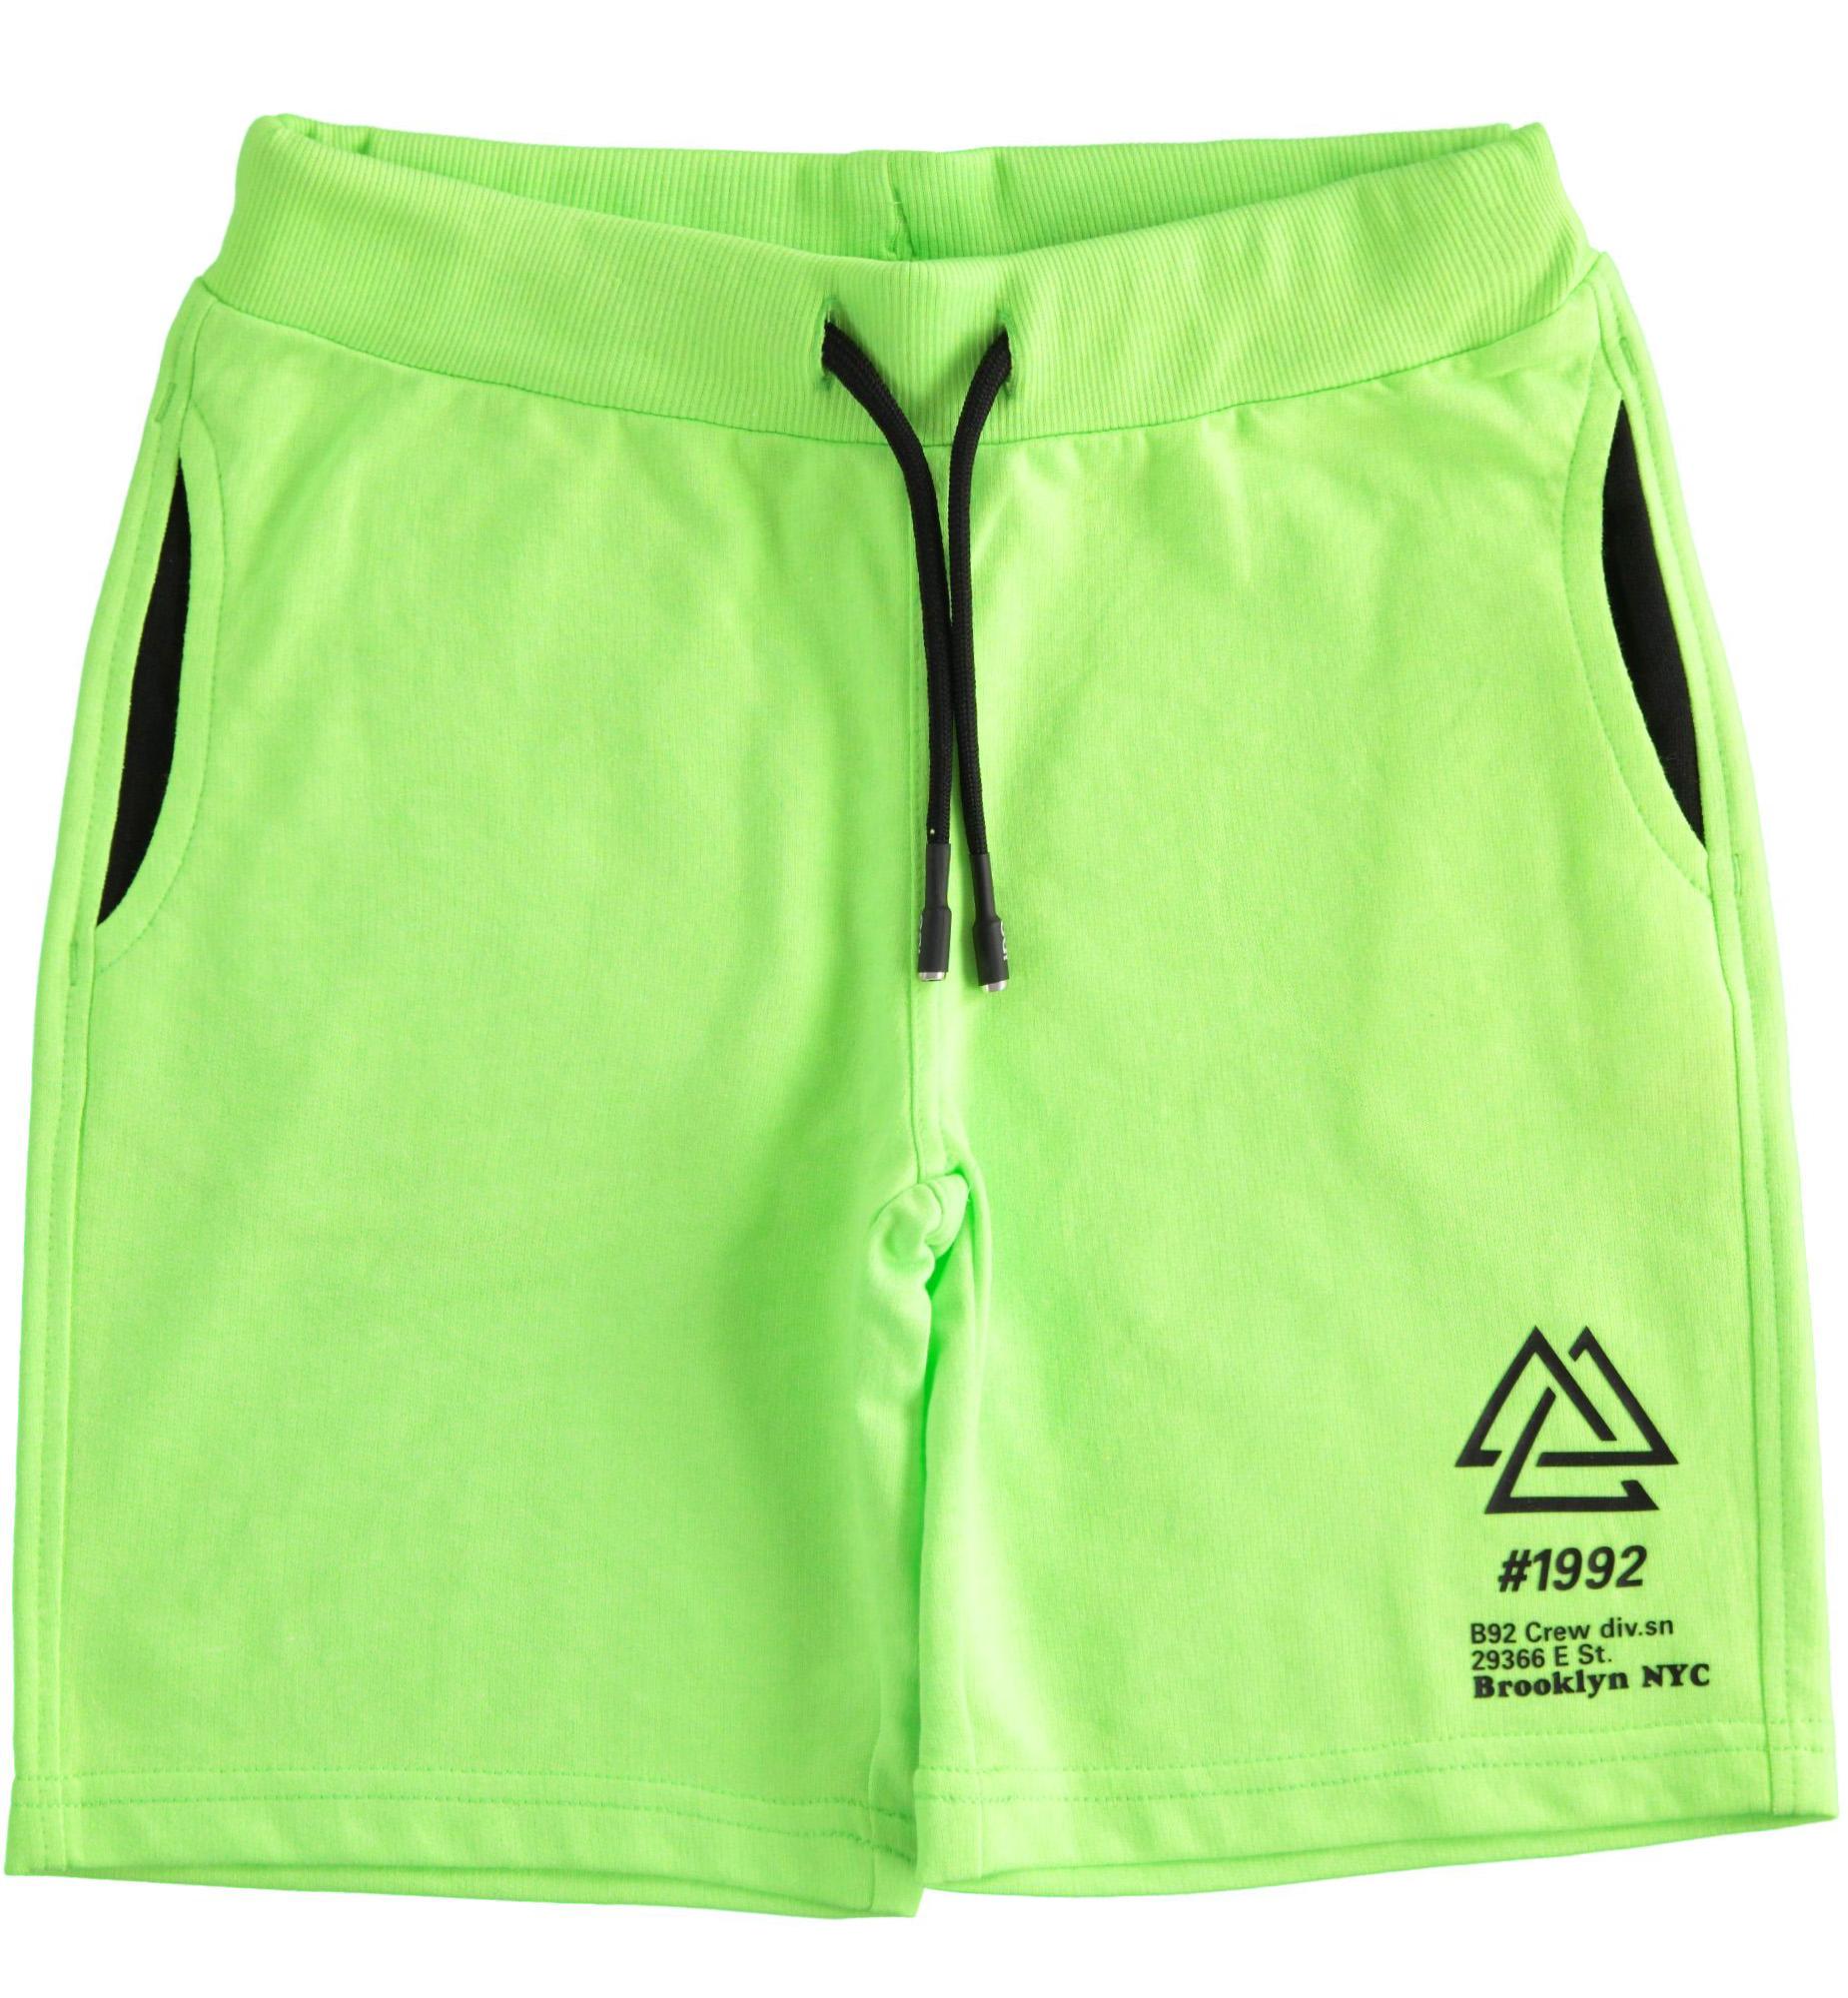 Neonzöld pamut bermuda nadrág fiúknak